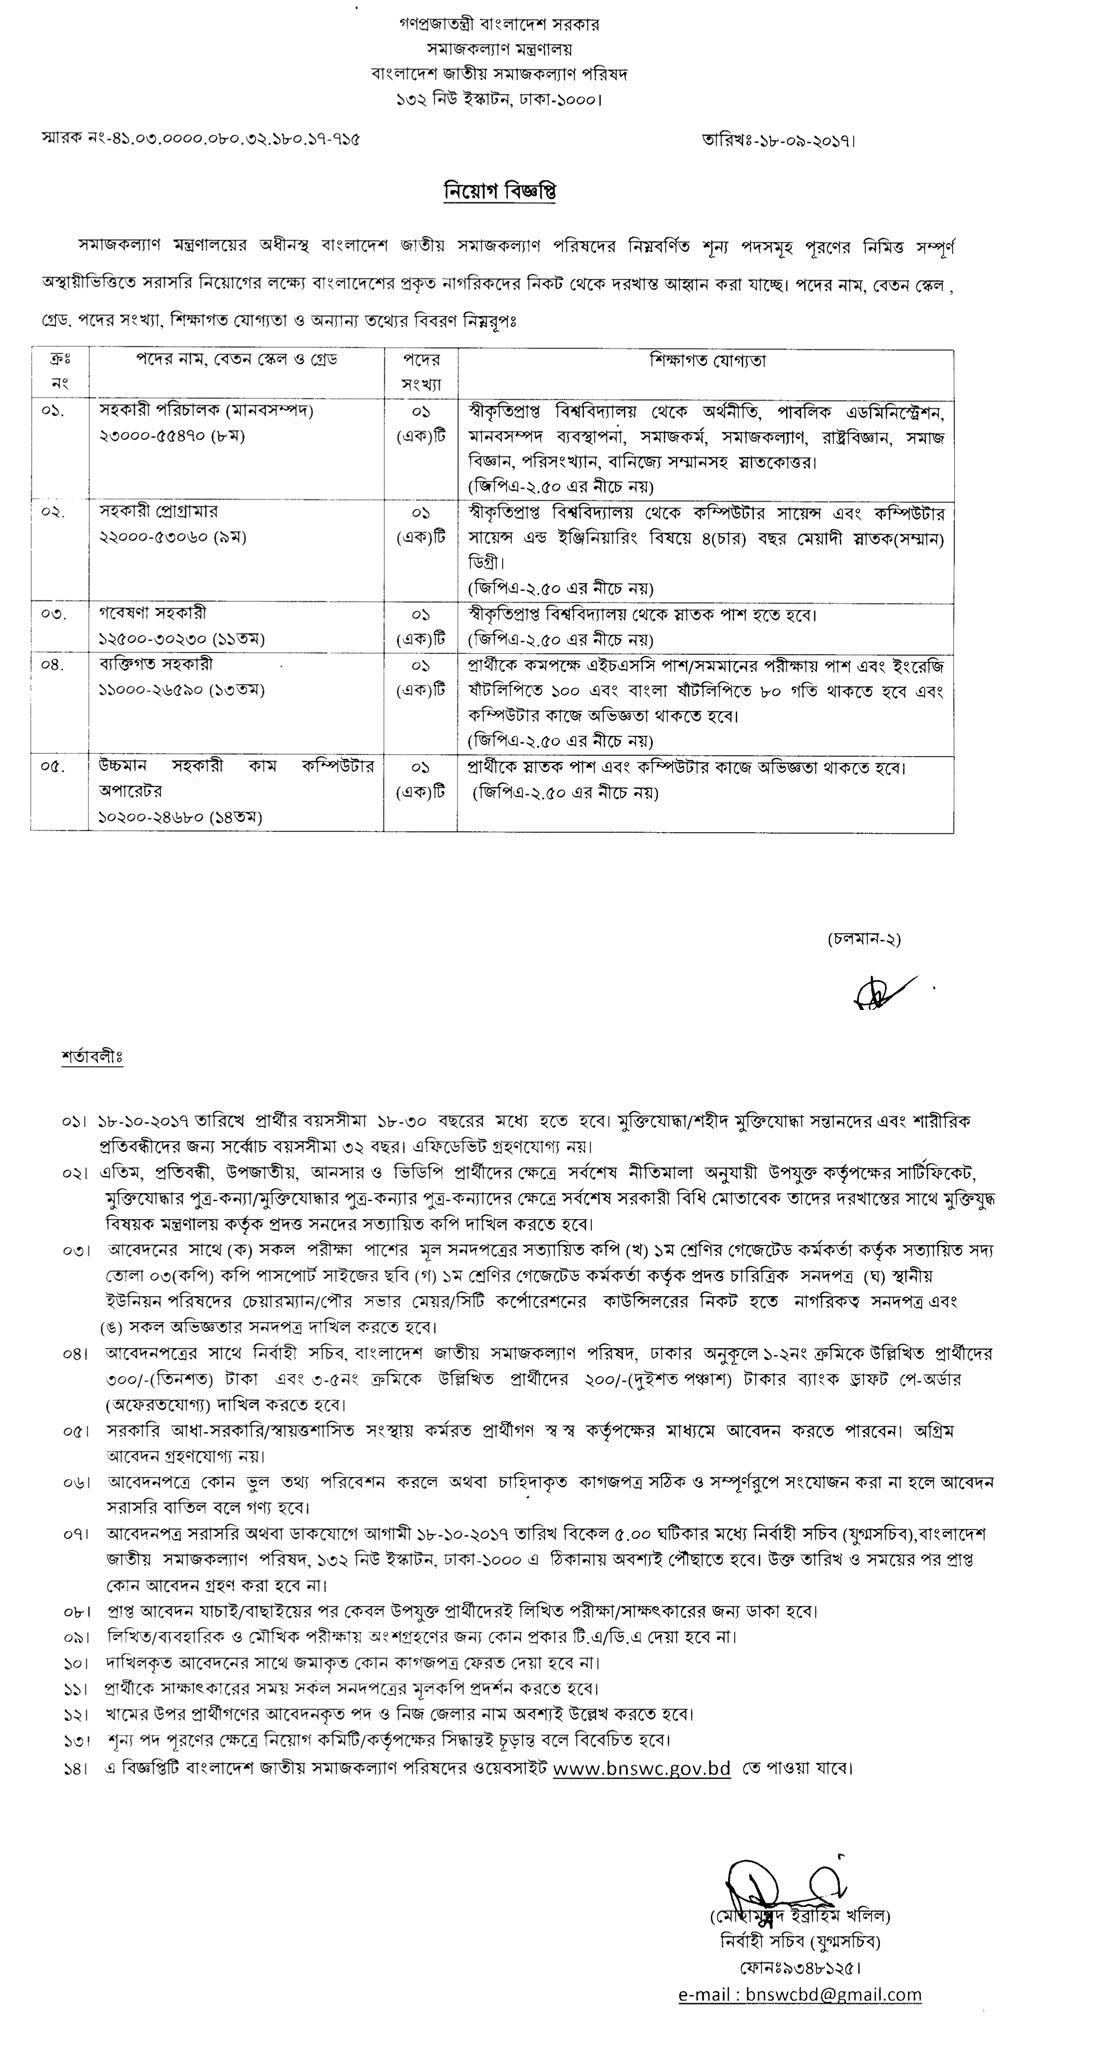 Ministry of Social Welfare (Bangladesh) Job Circular 2017